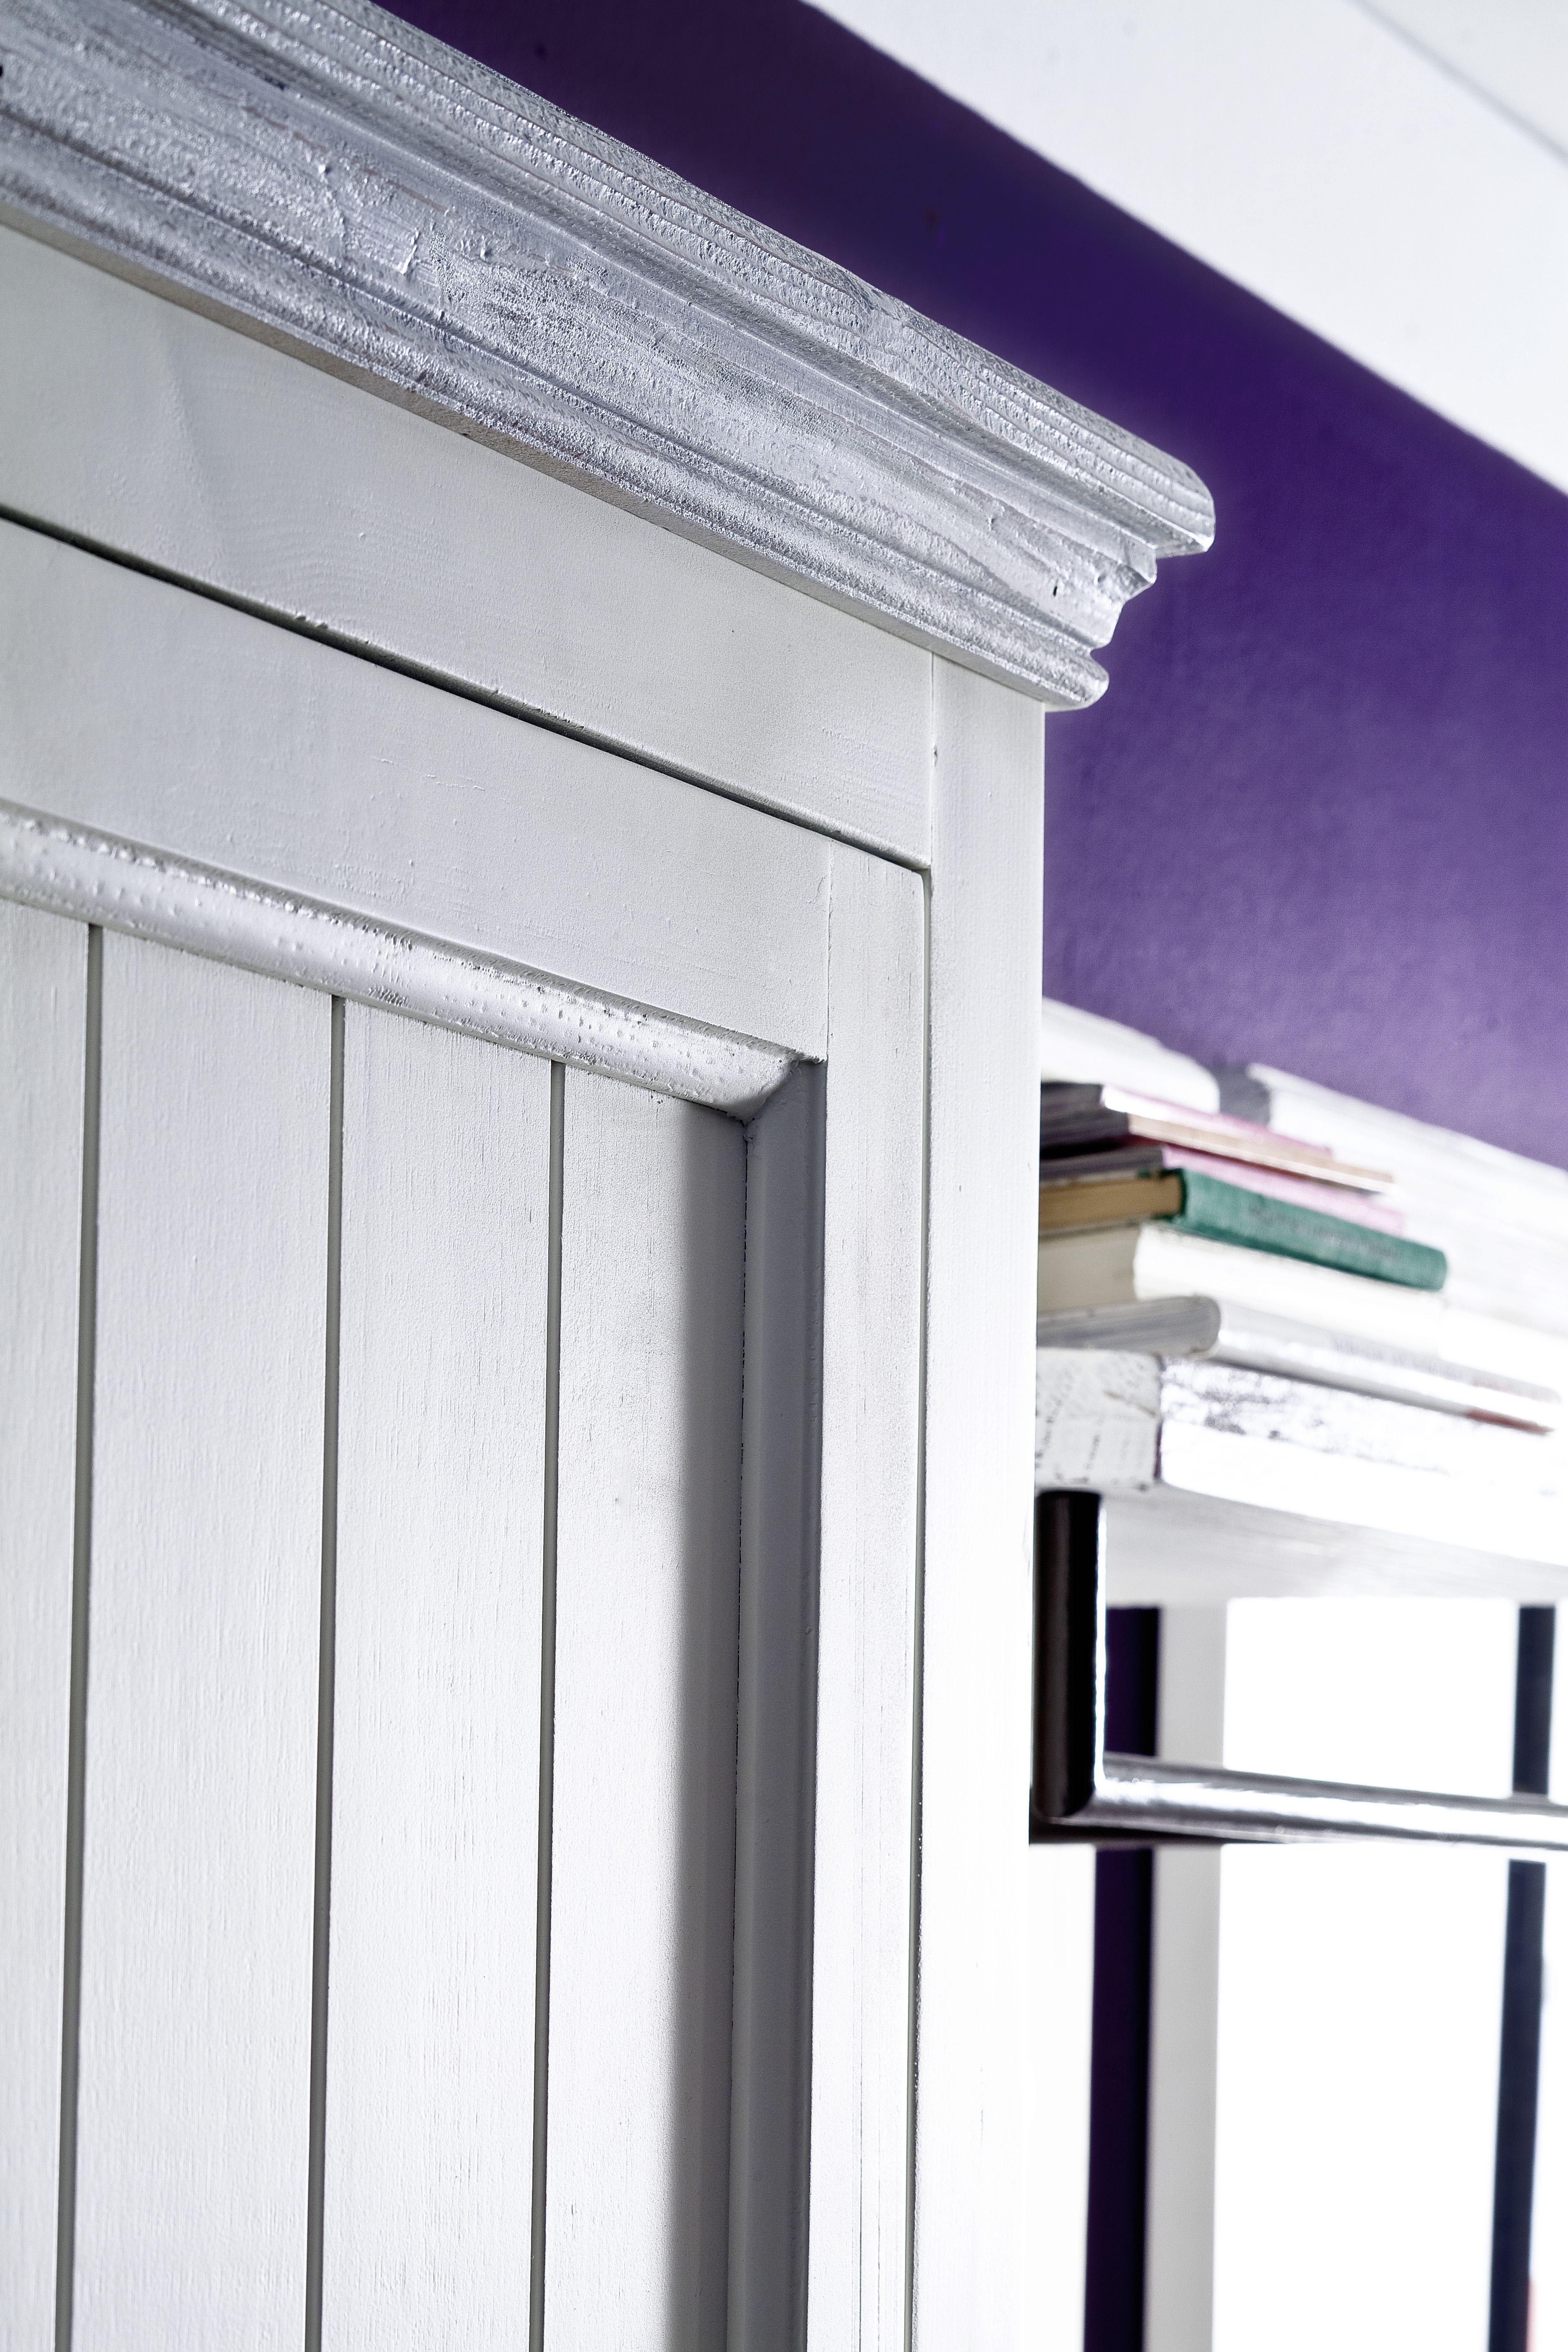 mca opus garderoben set 3 komplette garderobe f r flur mit. Black Bedroom Furniture Sets. Home Design Ideas